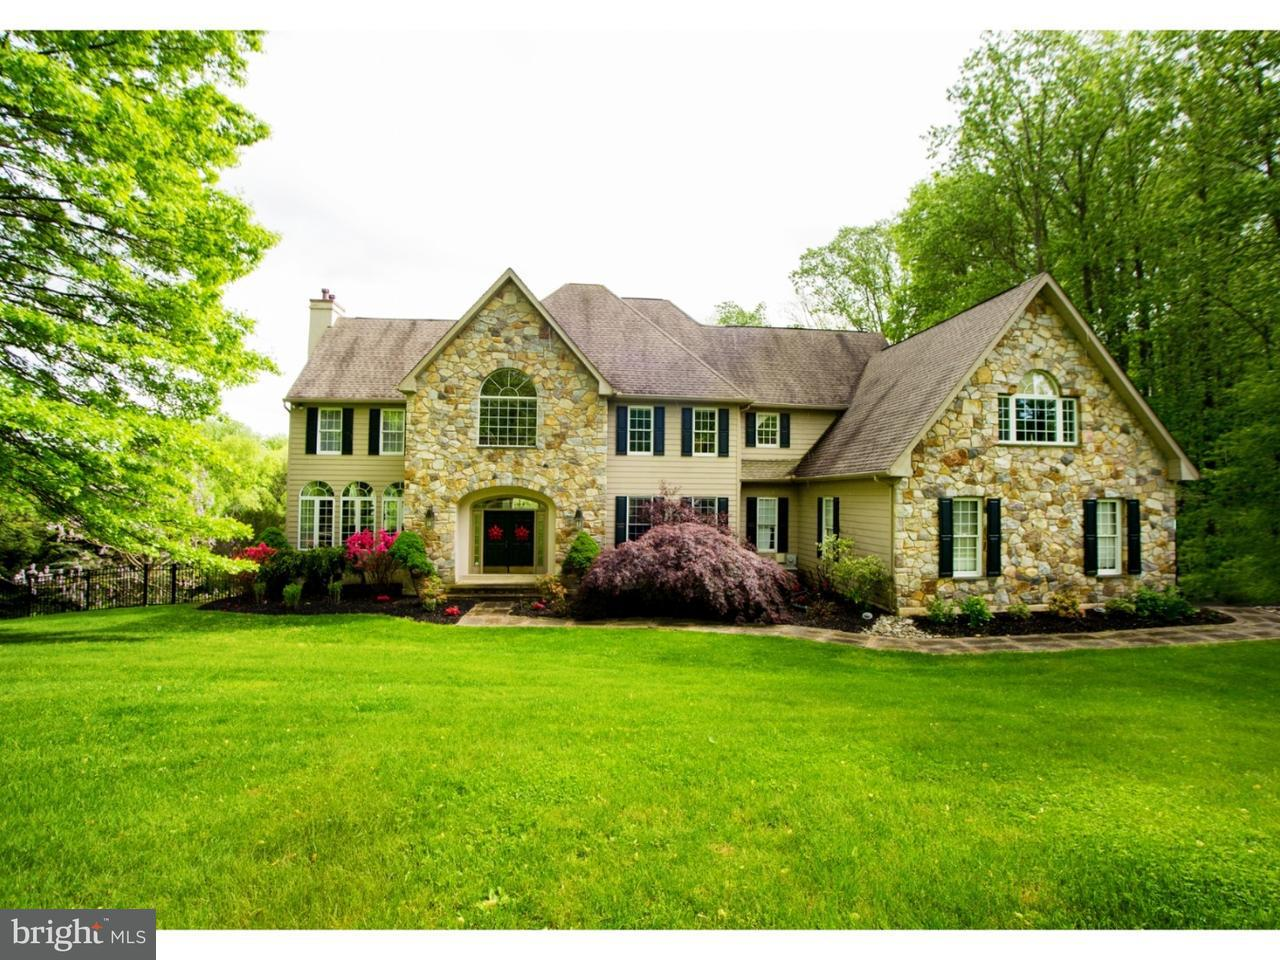 Single Family Home for Sale at 8 HONEYSUCKLE Court Glen Mills, Pennsylvania 19342 United States